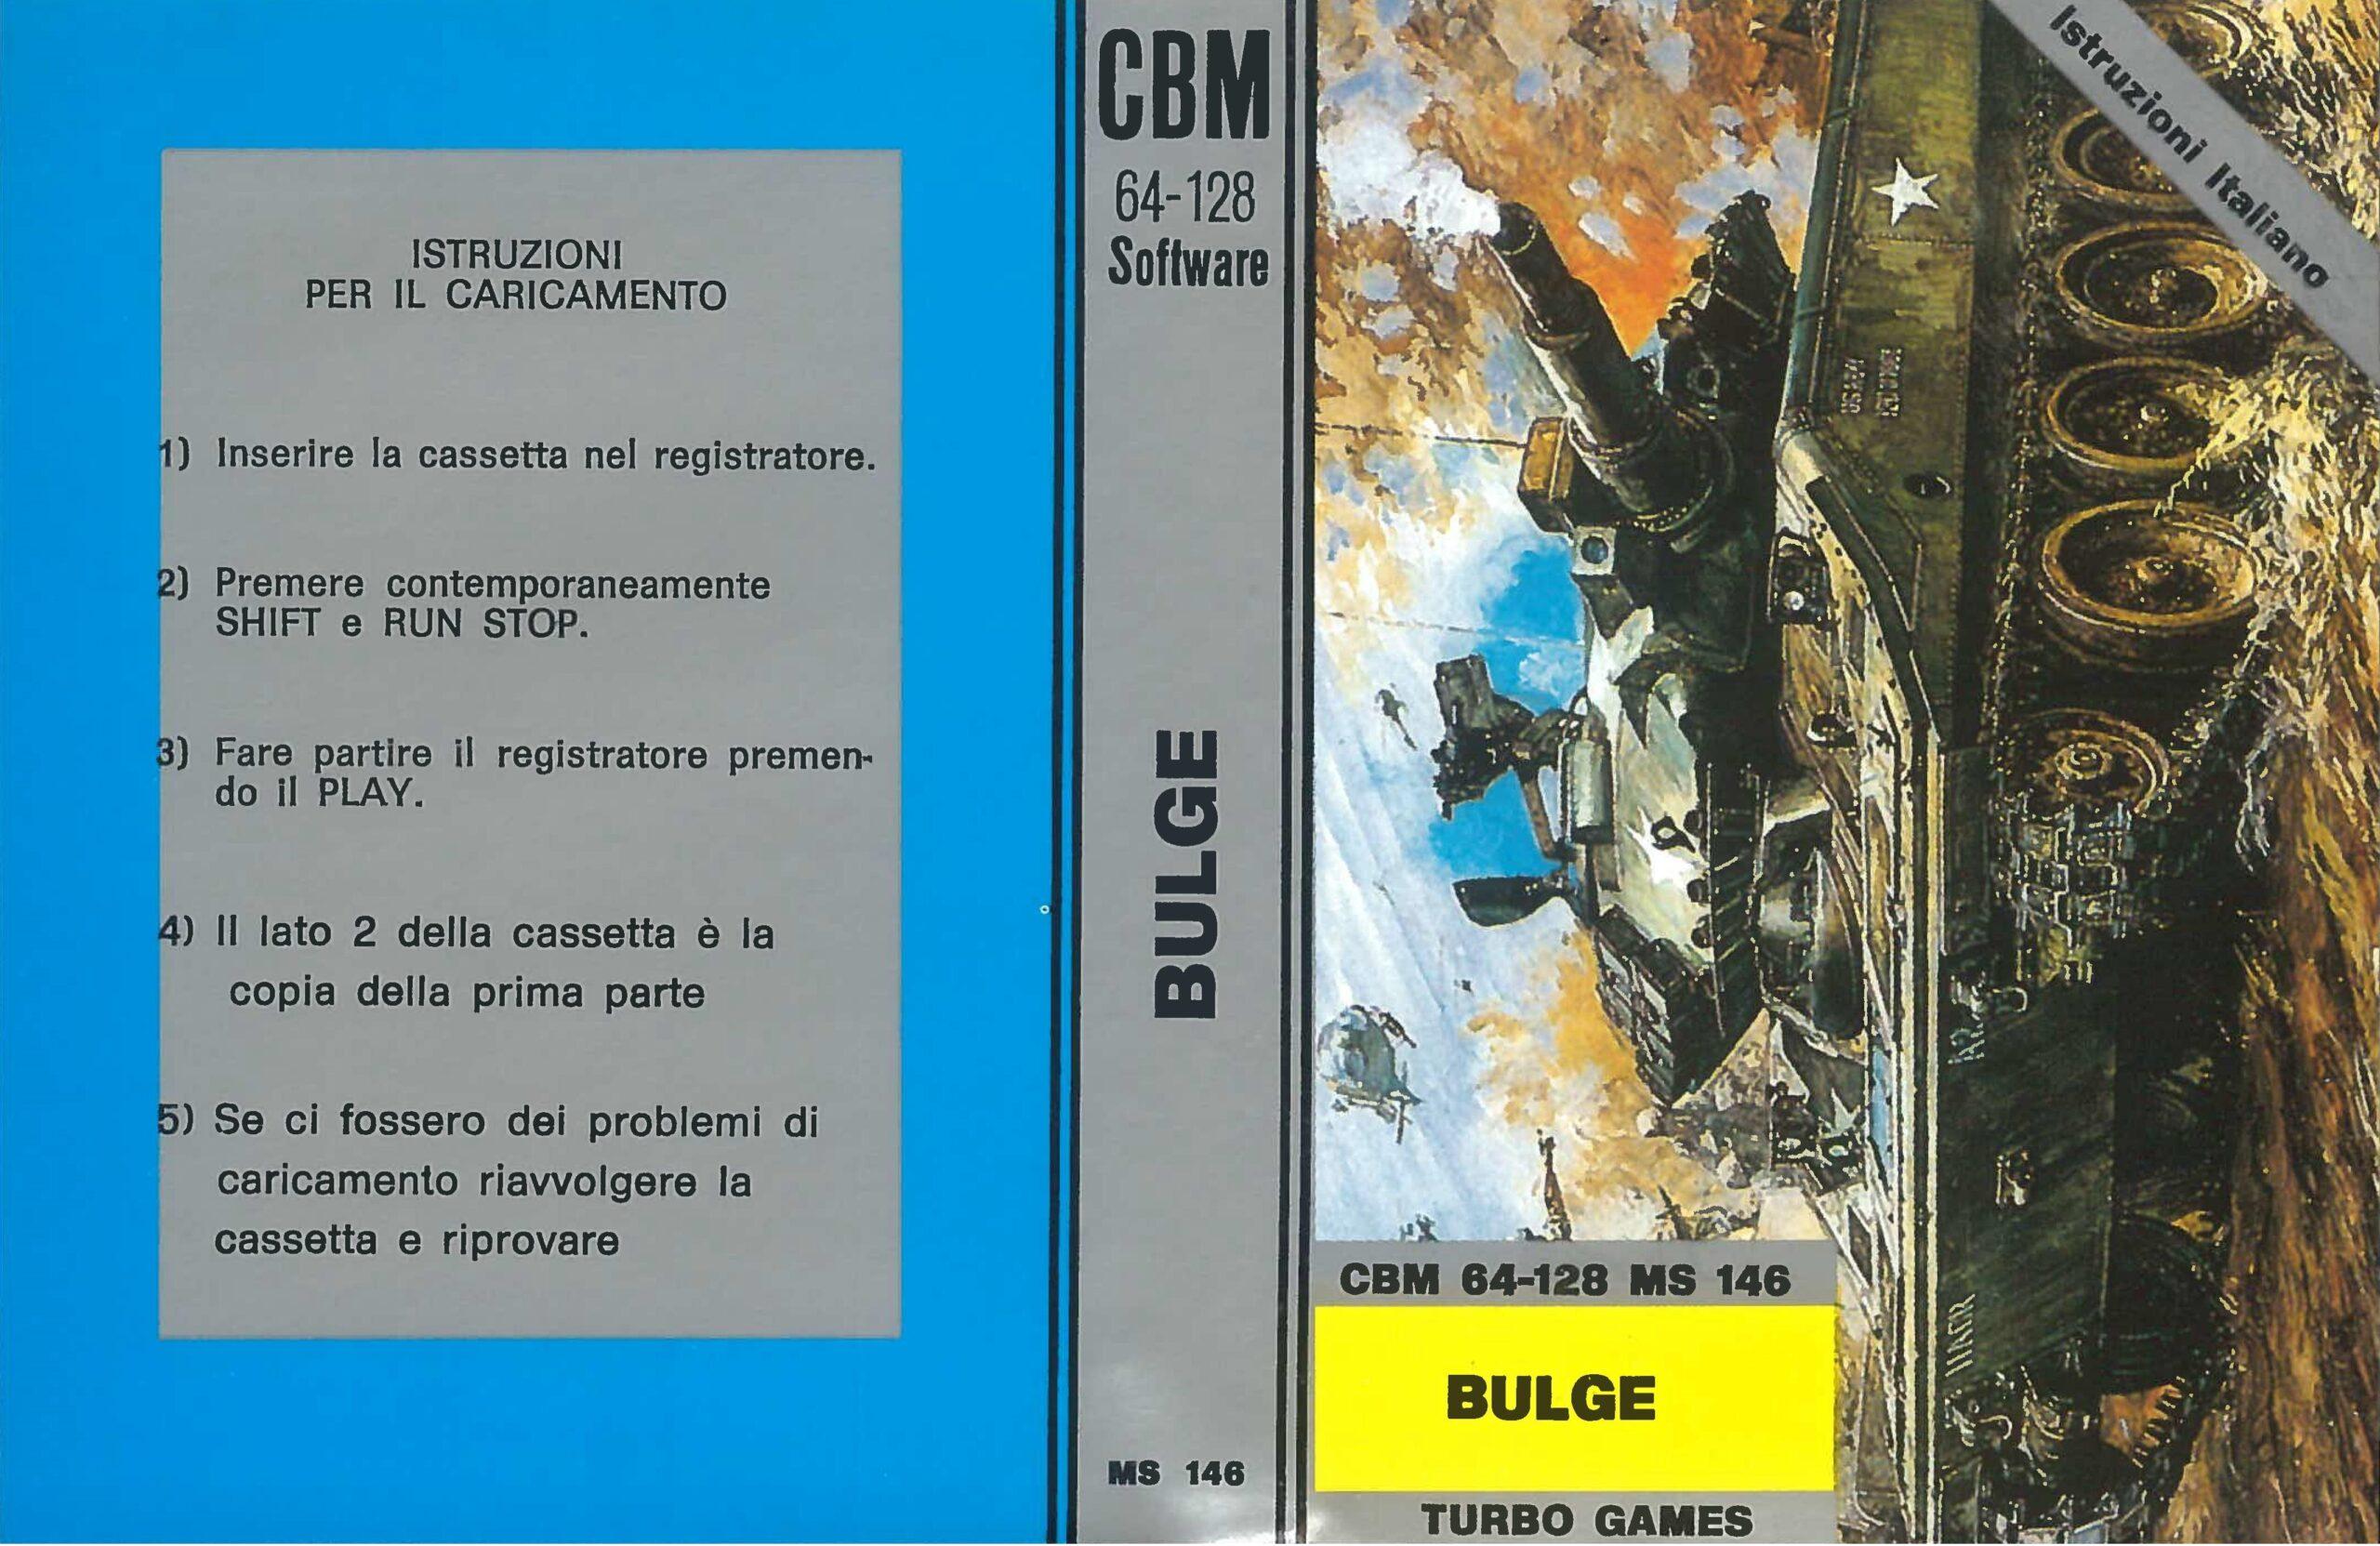 BULGE MS 146